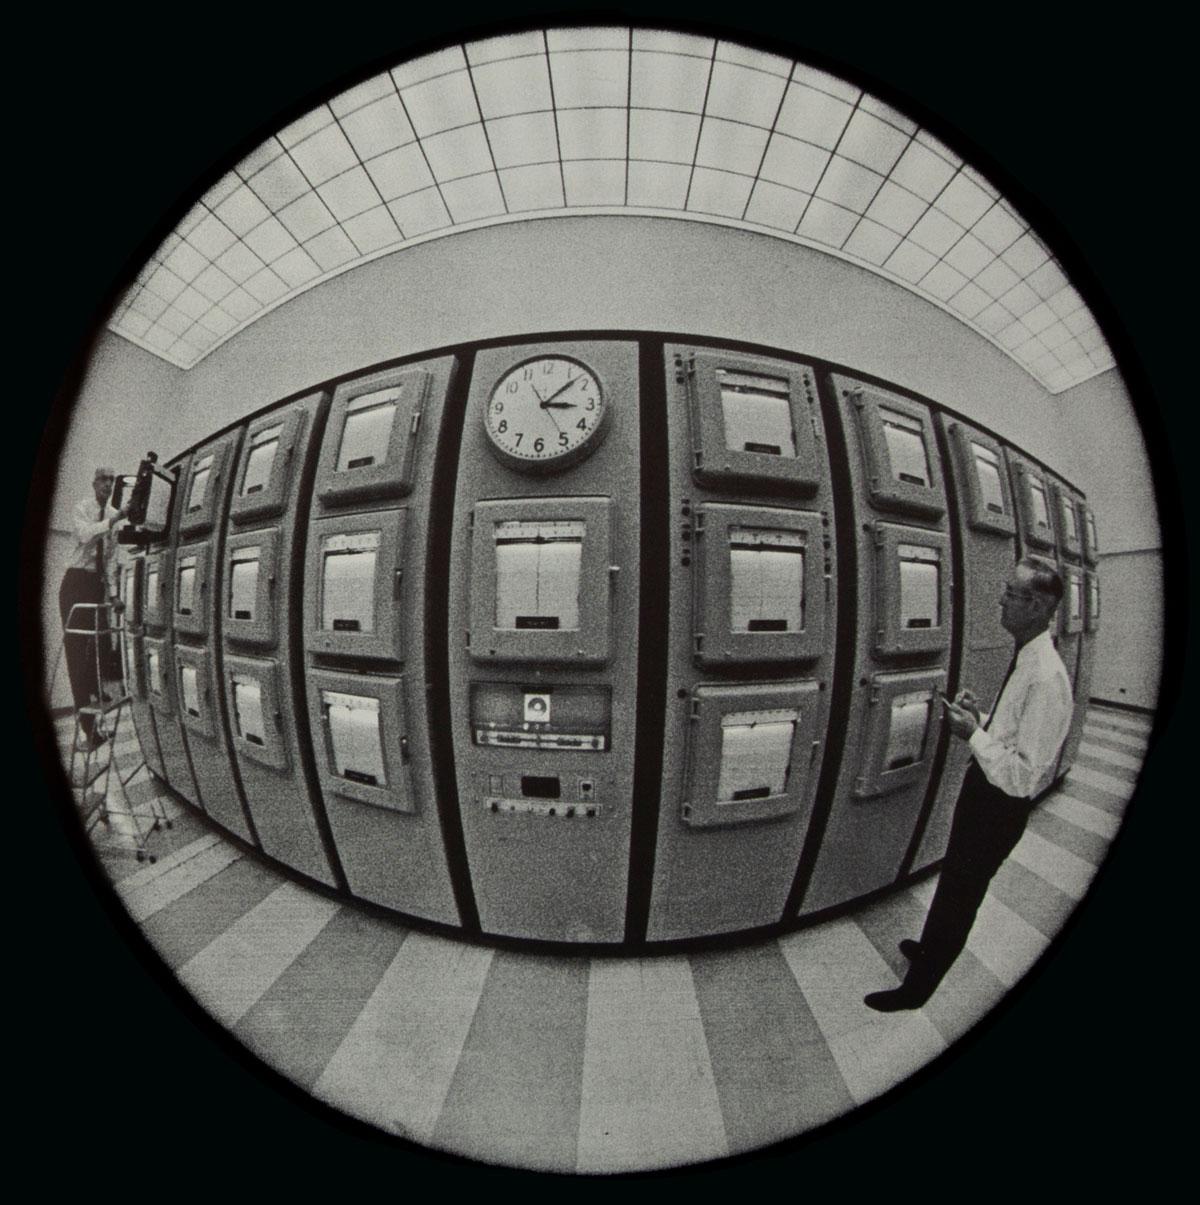 1960s power grid